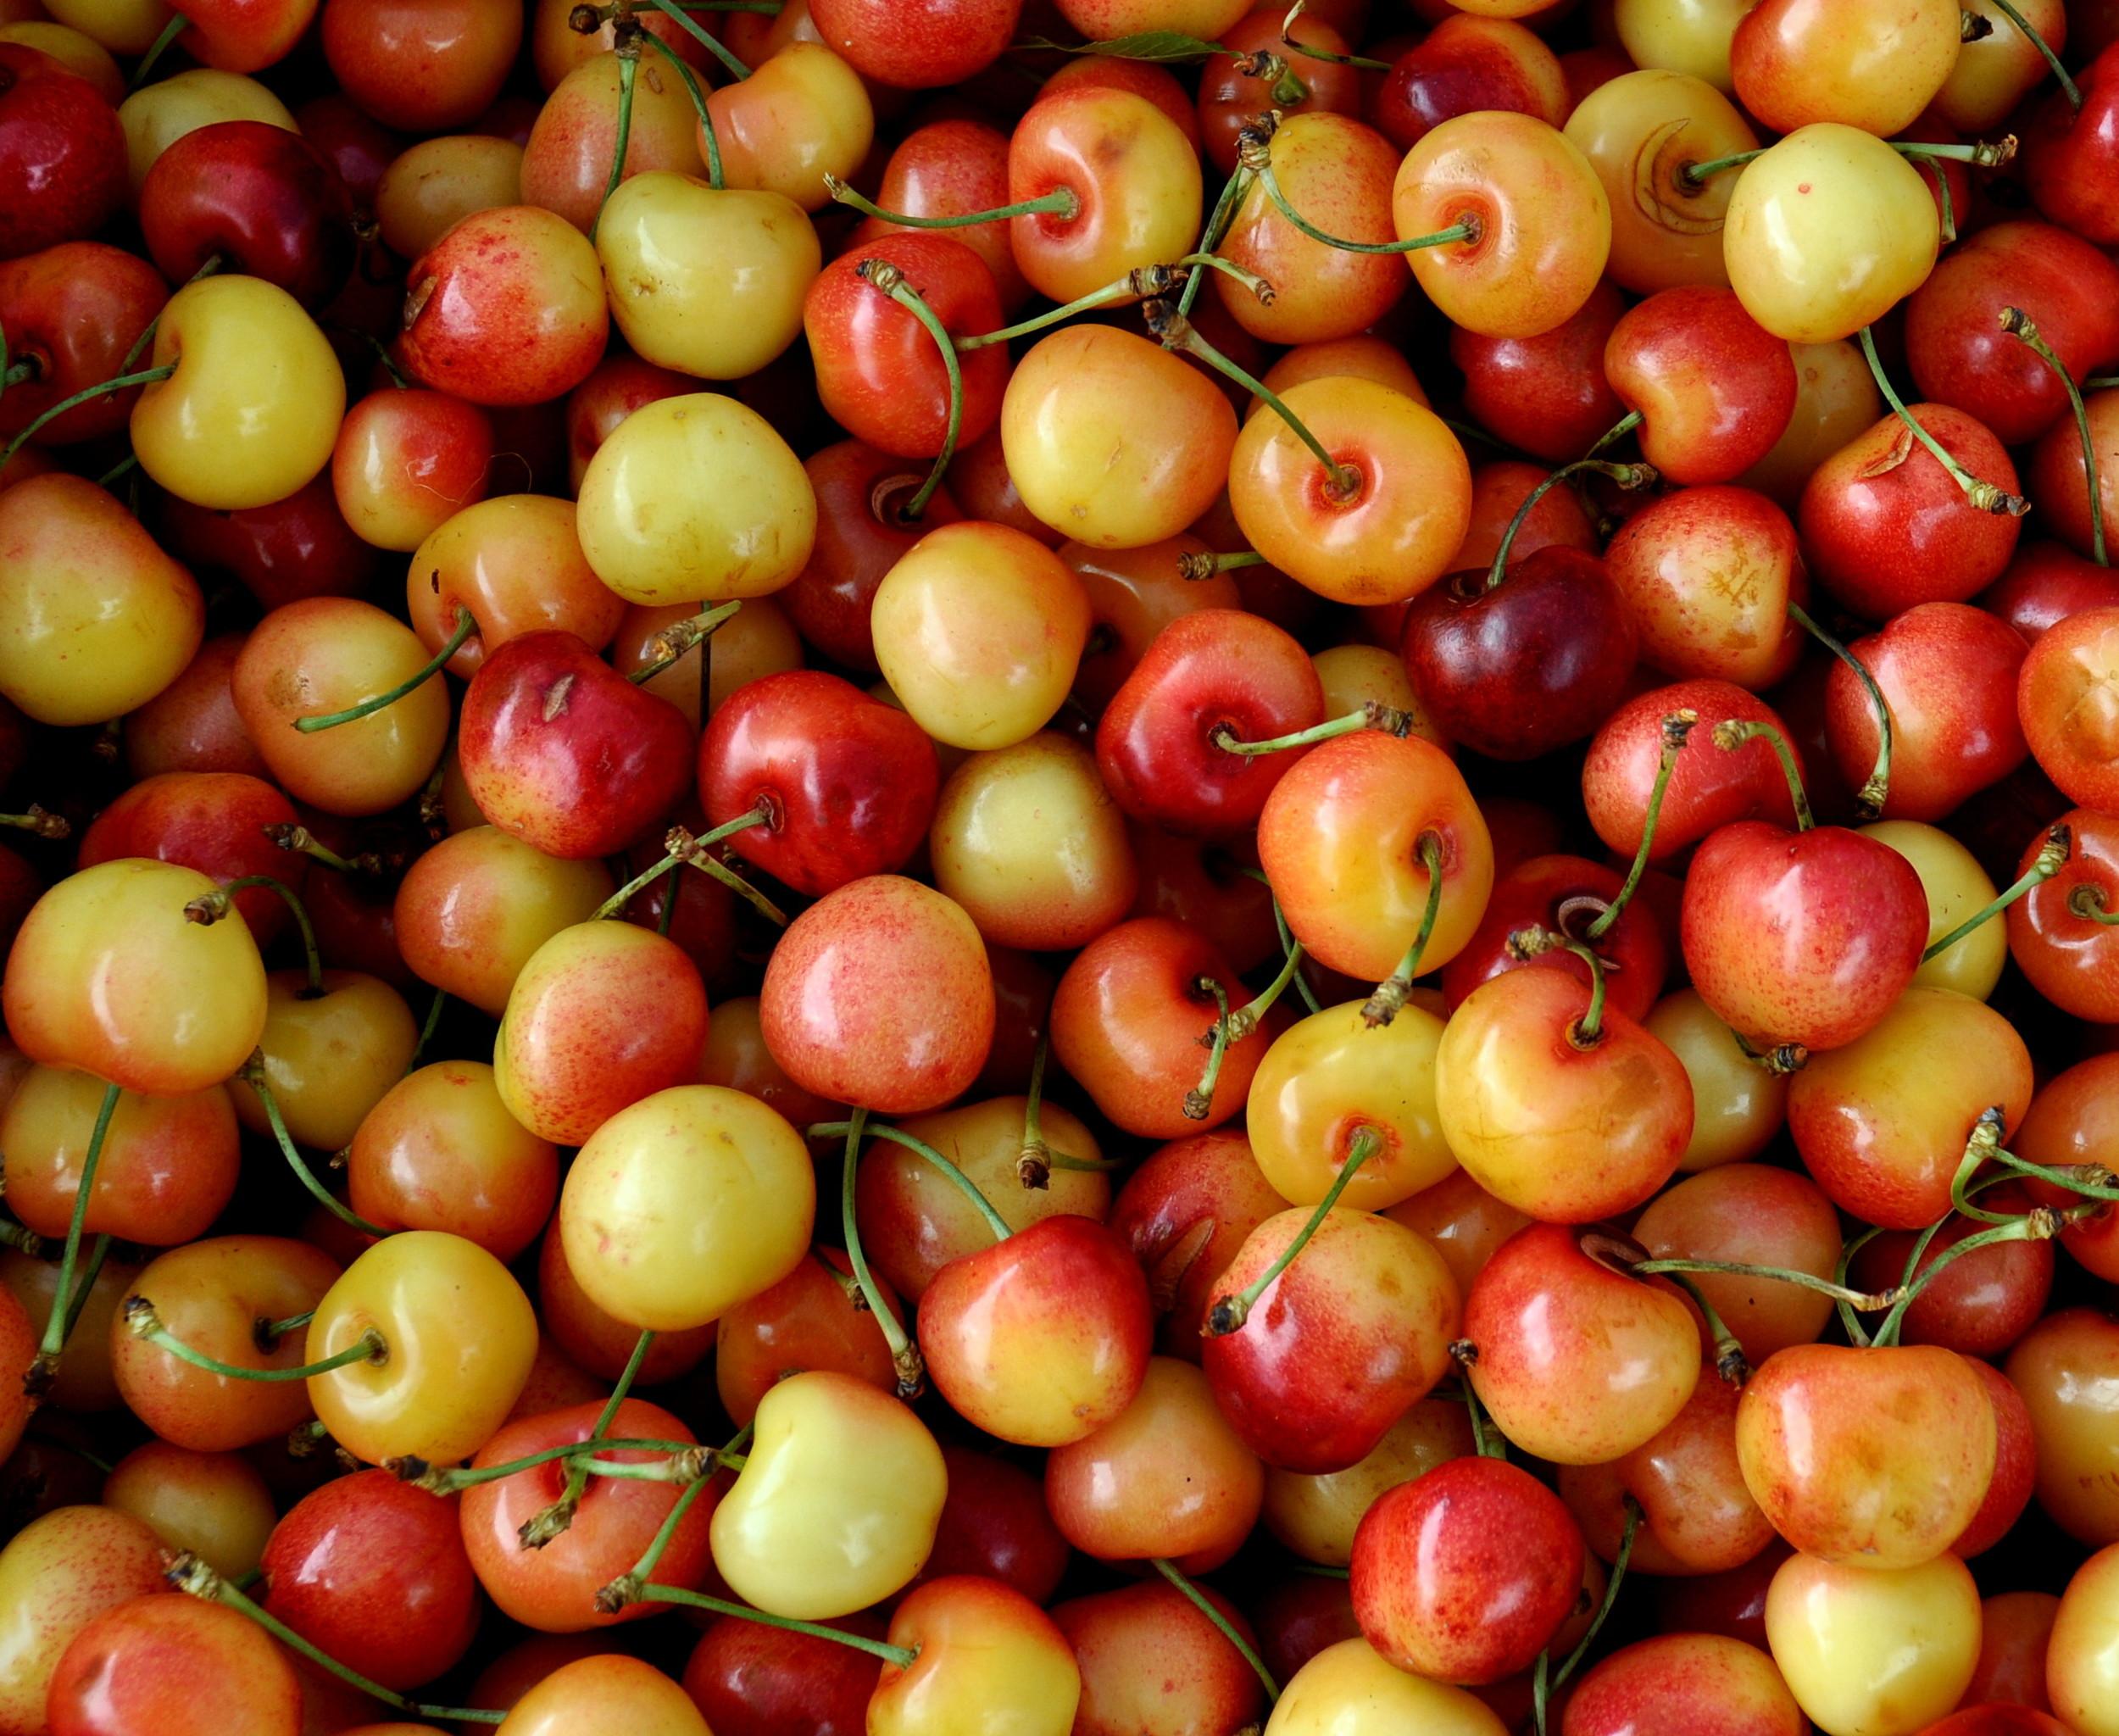 Rainier cherries from Lyall Farms. Photo copyright 2013 by Zachary D. Lyons.